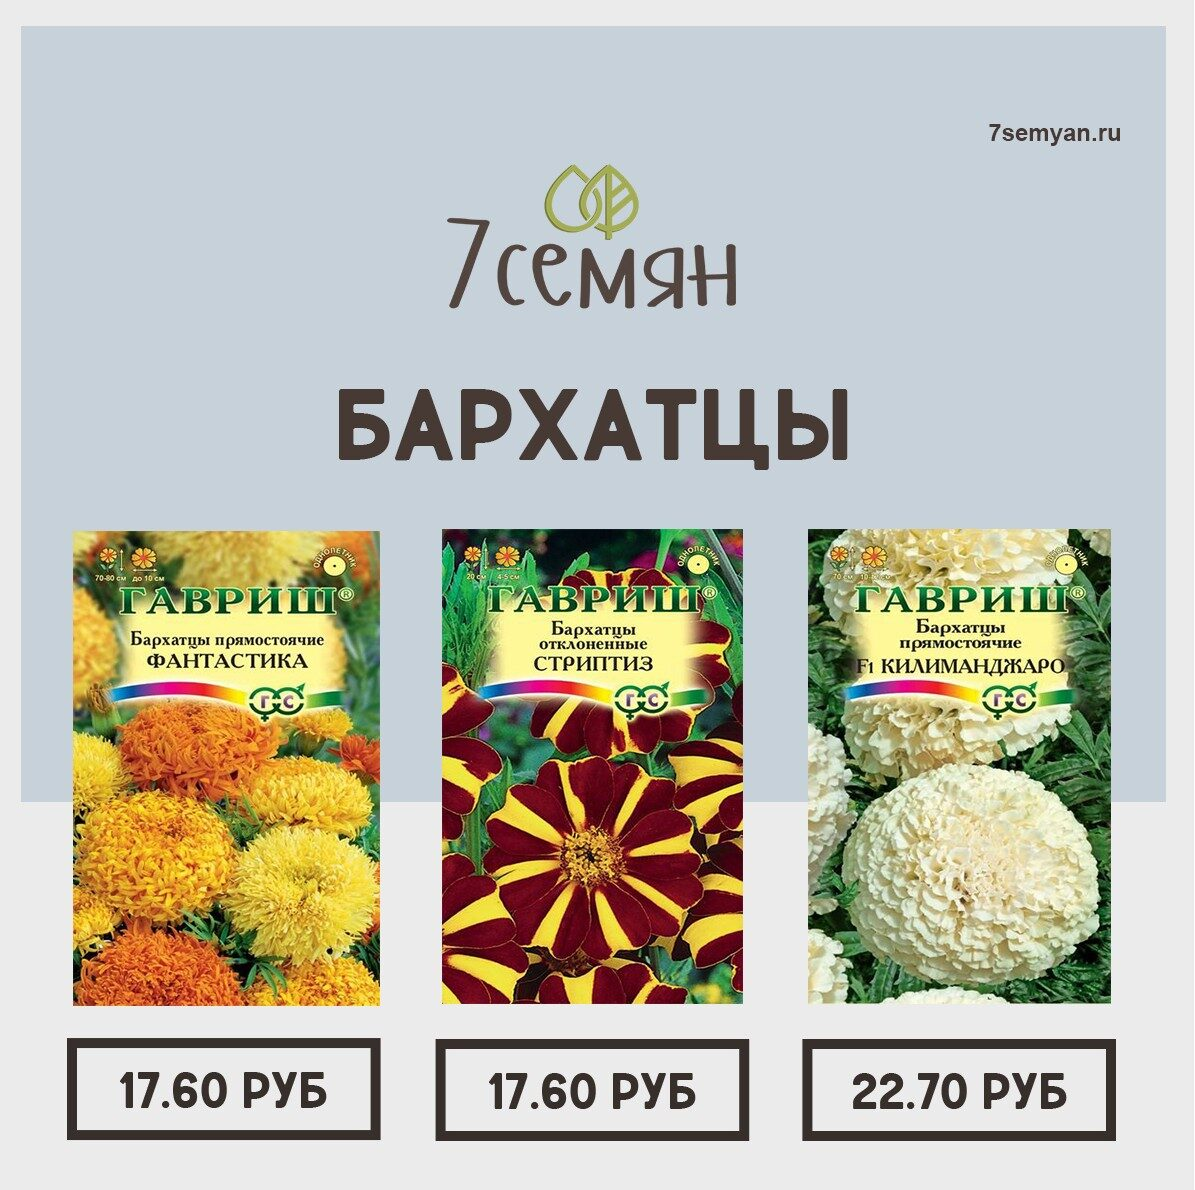 Www 7semyan Ru Интернет Магазин